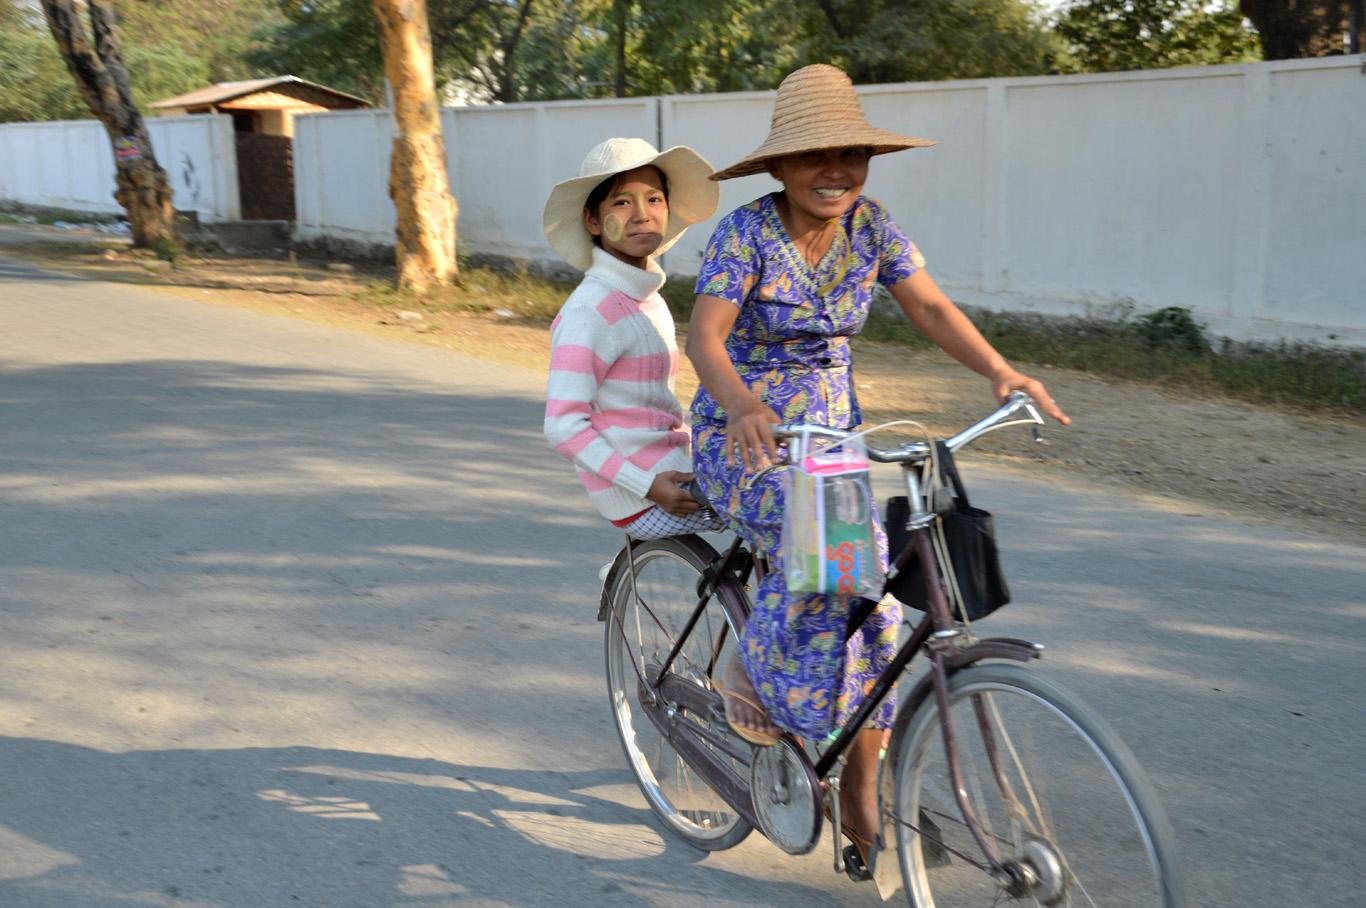 Locals on a bike